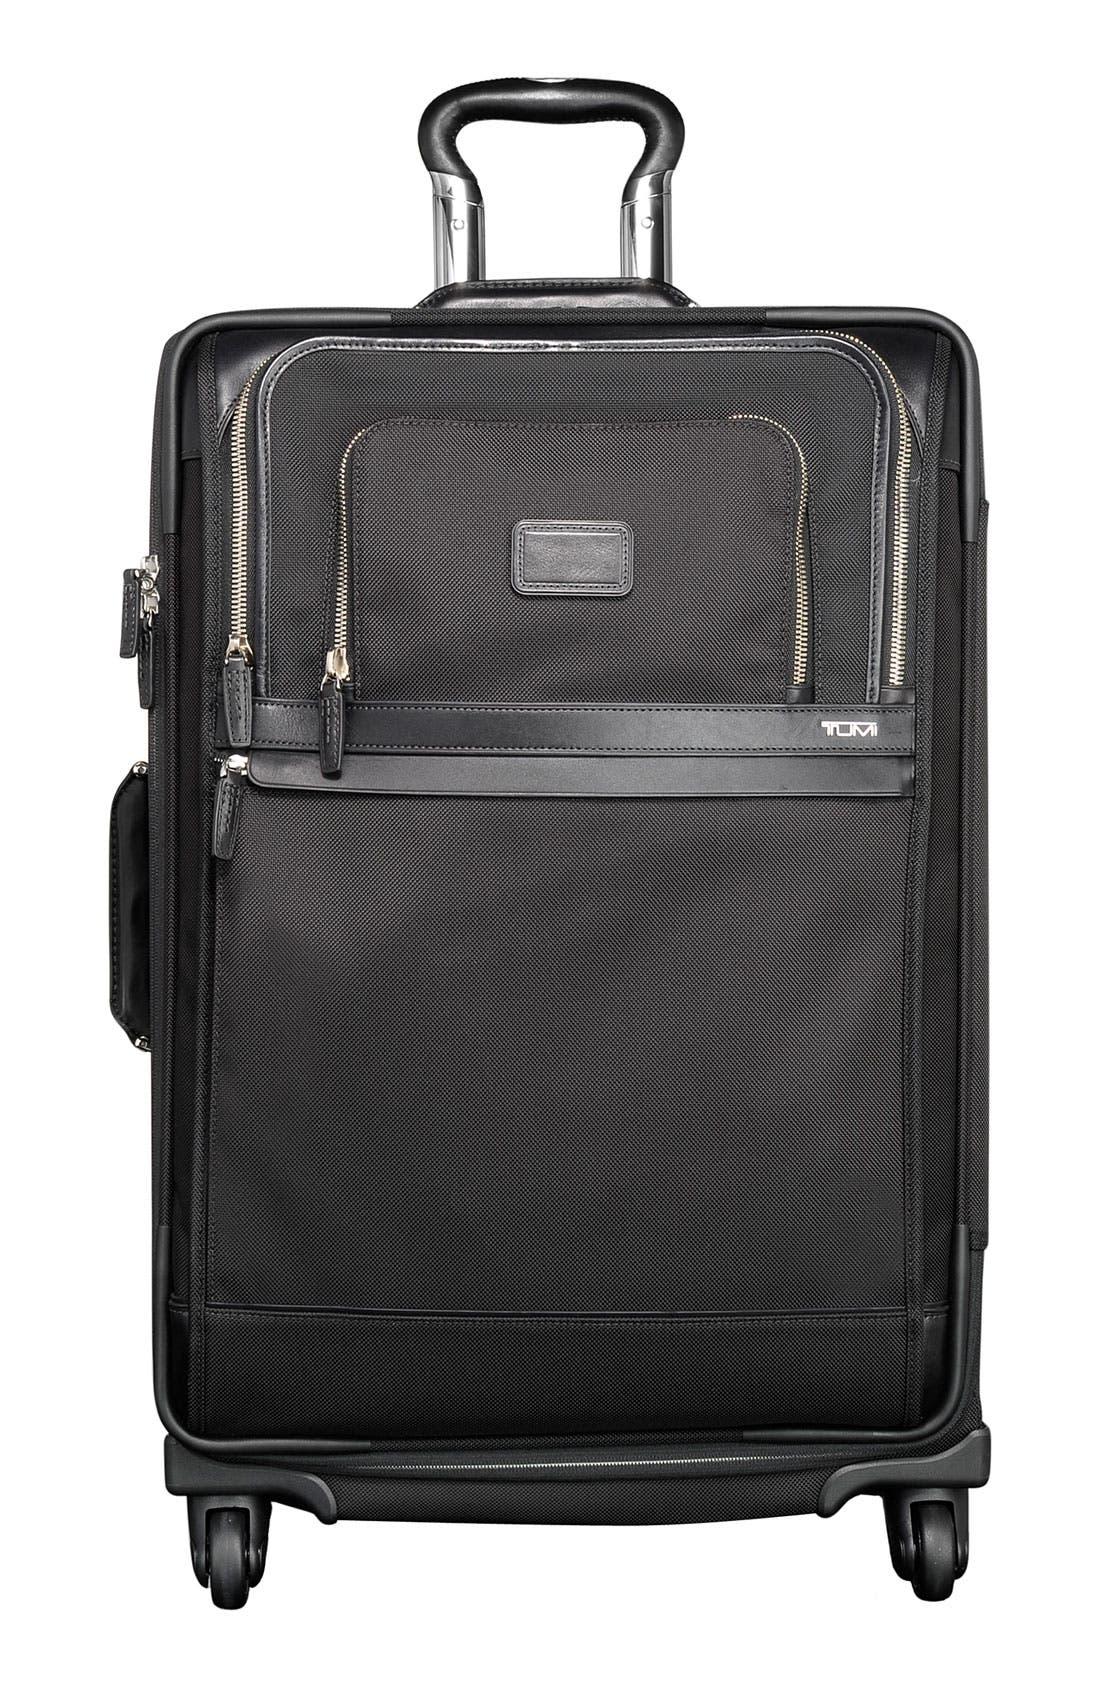 Alternate Image 1 Selected - Tumi 'Bedford - Wakeman' 4-Wheeled Long Distance Trip Suitcase